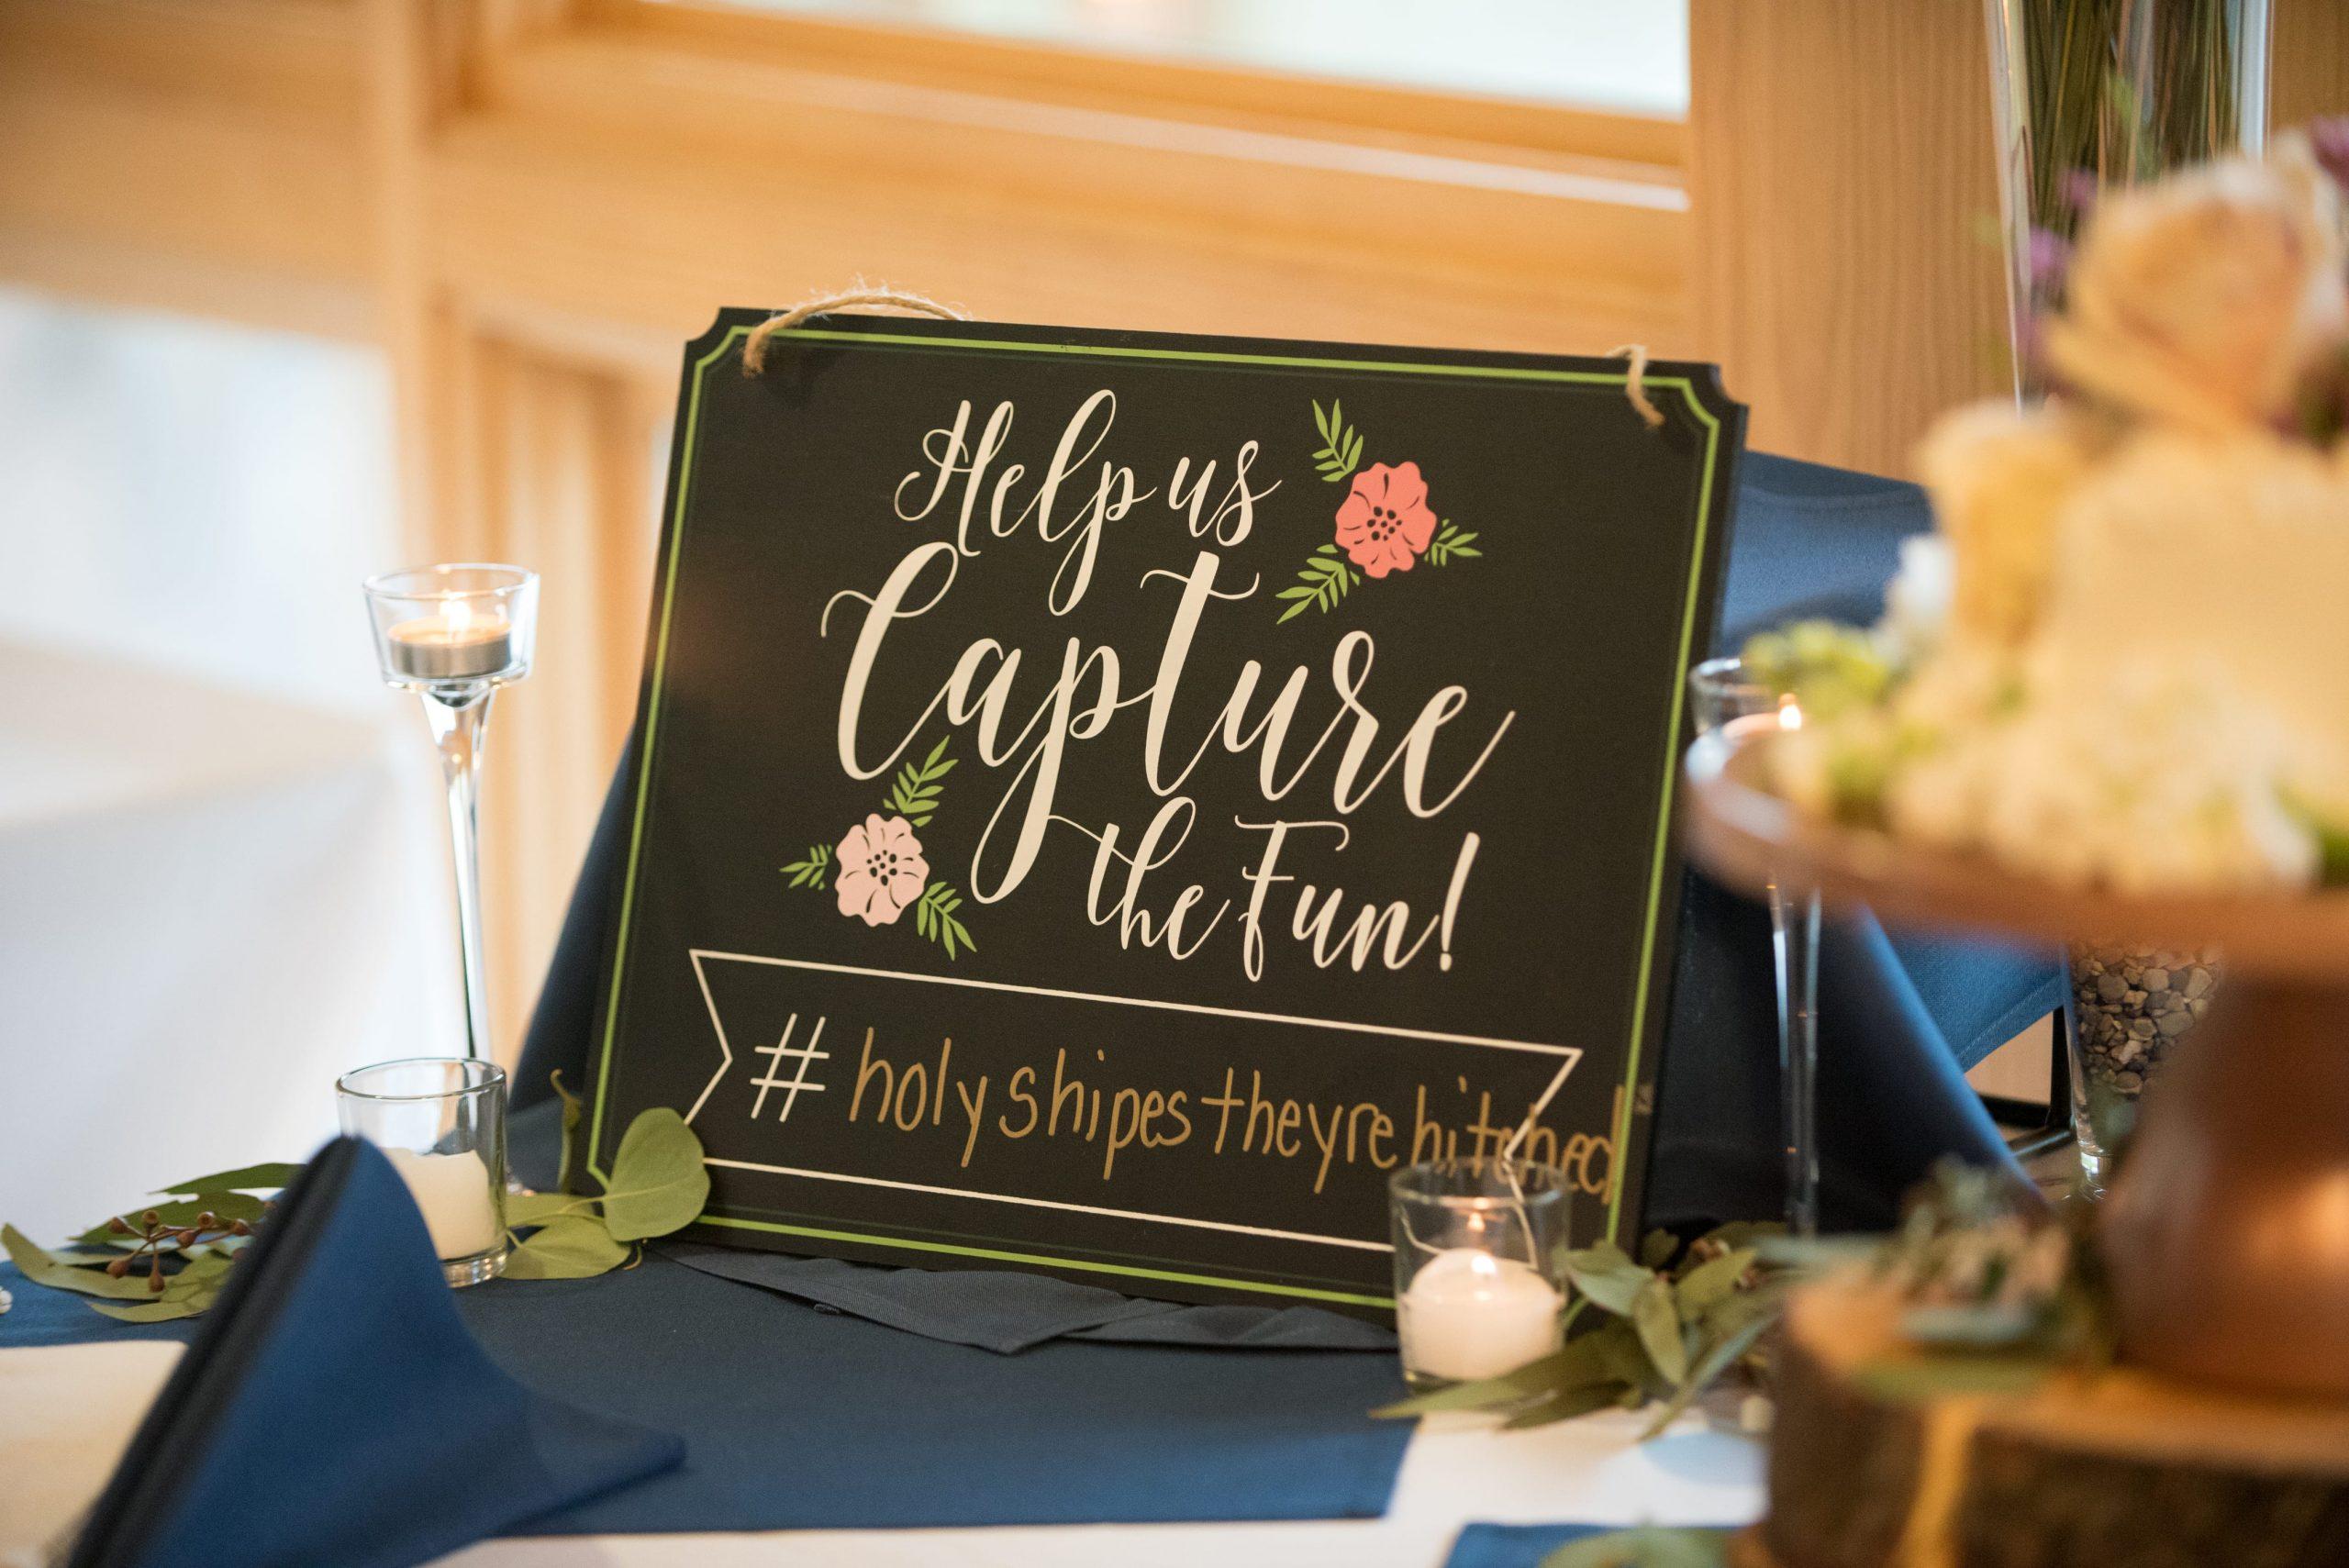 Help Us Capture the Fun wedding hashtag sign